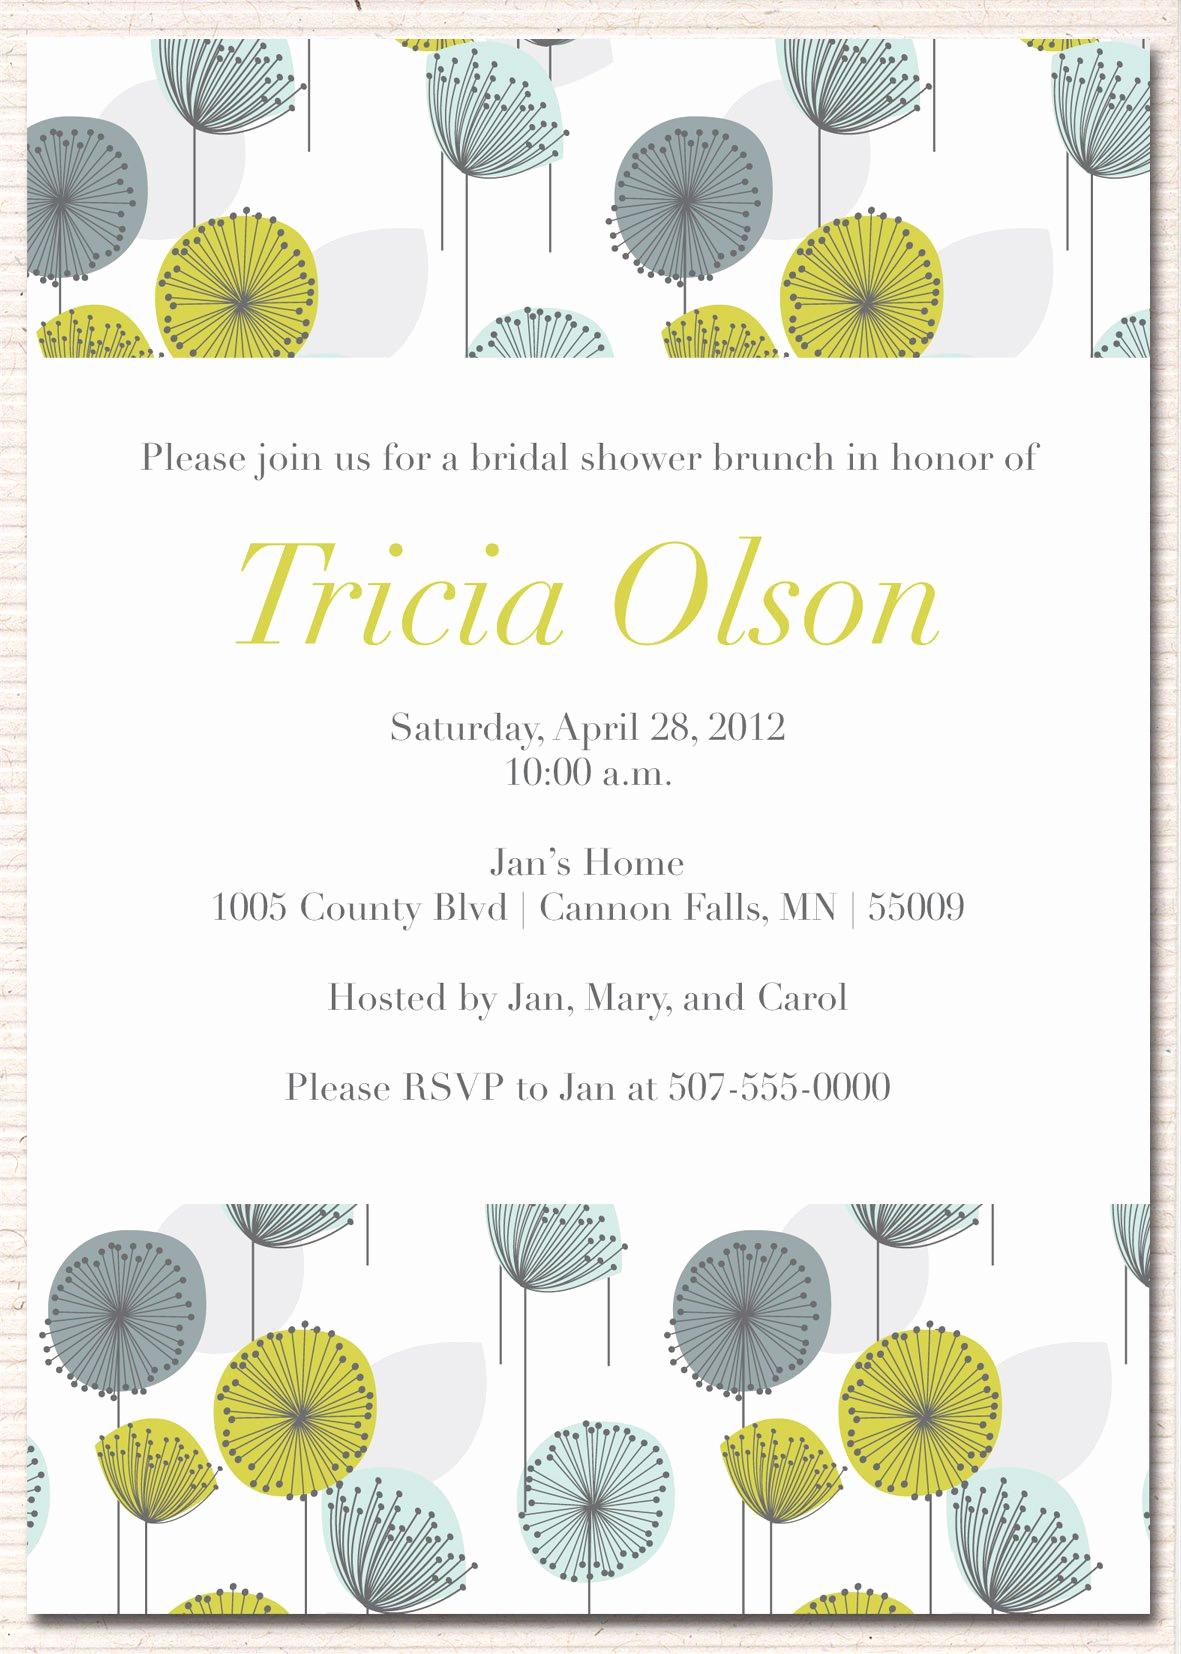 Bridal Shower Brunch Invitation Unique Wedding Invitation Sample Wedding Invitation Card New